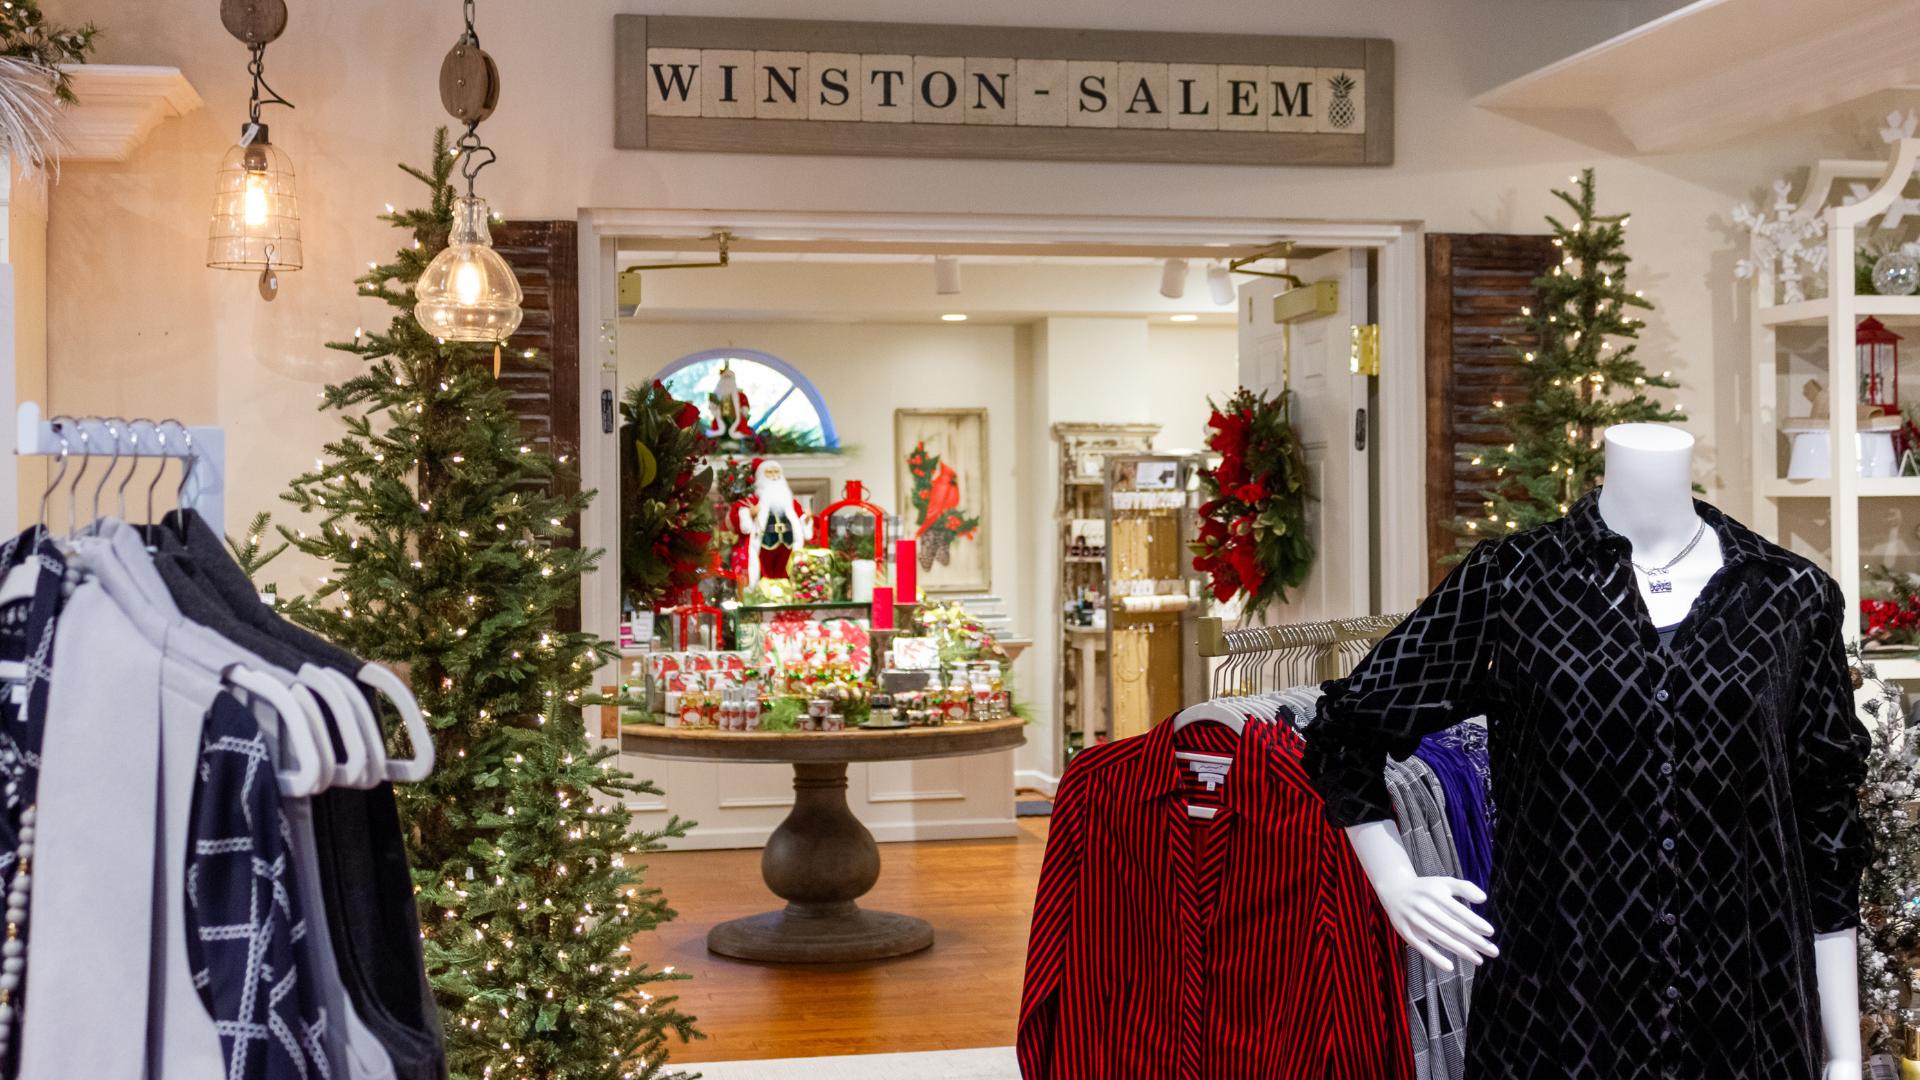 Specialty Store In Winston Salem | Winston-Salem | Salem Creek